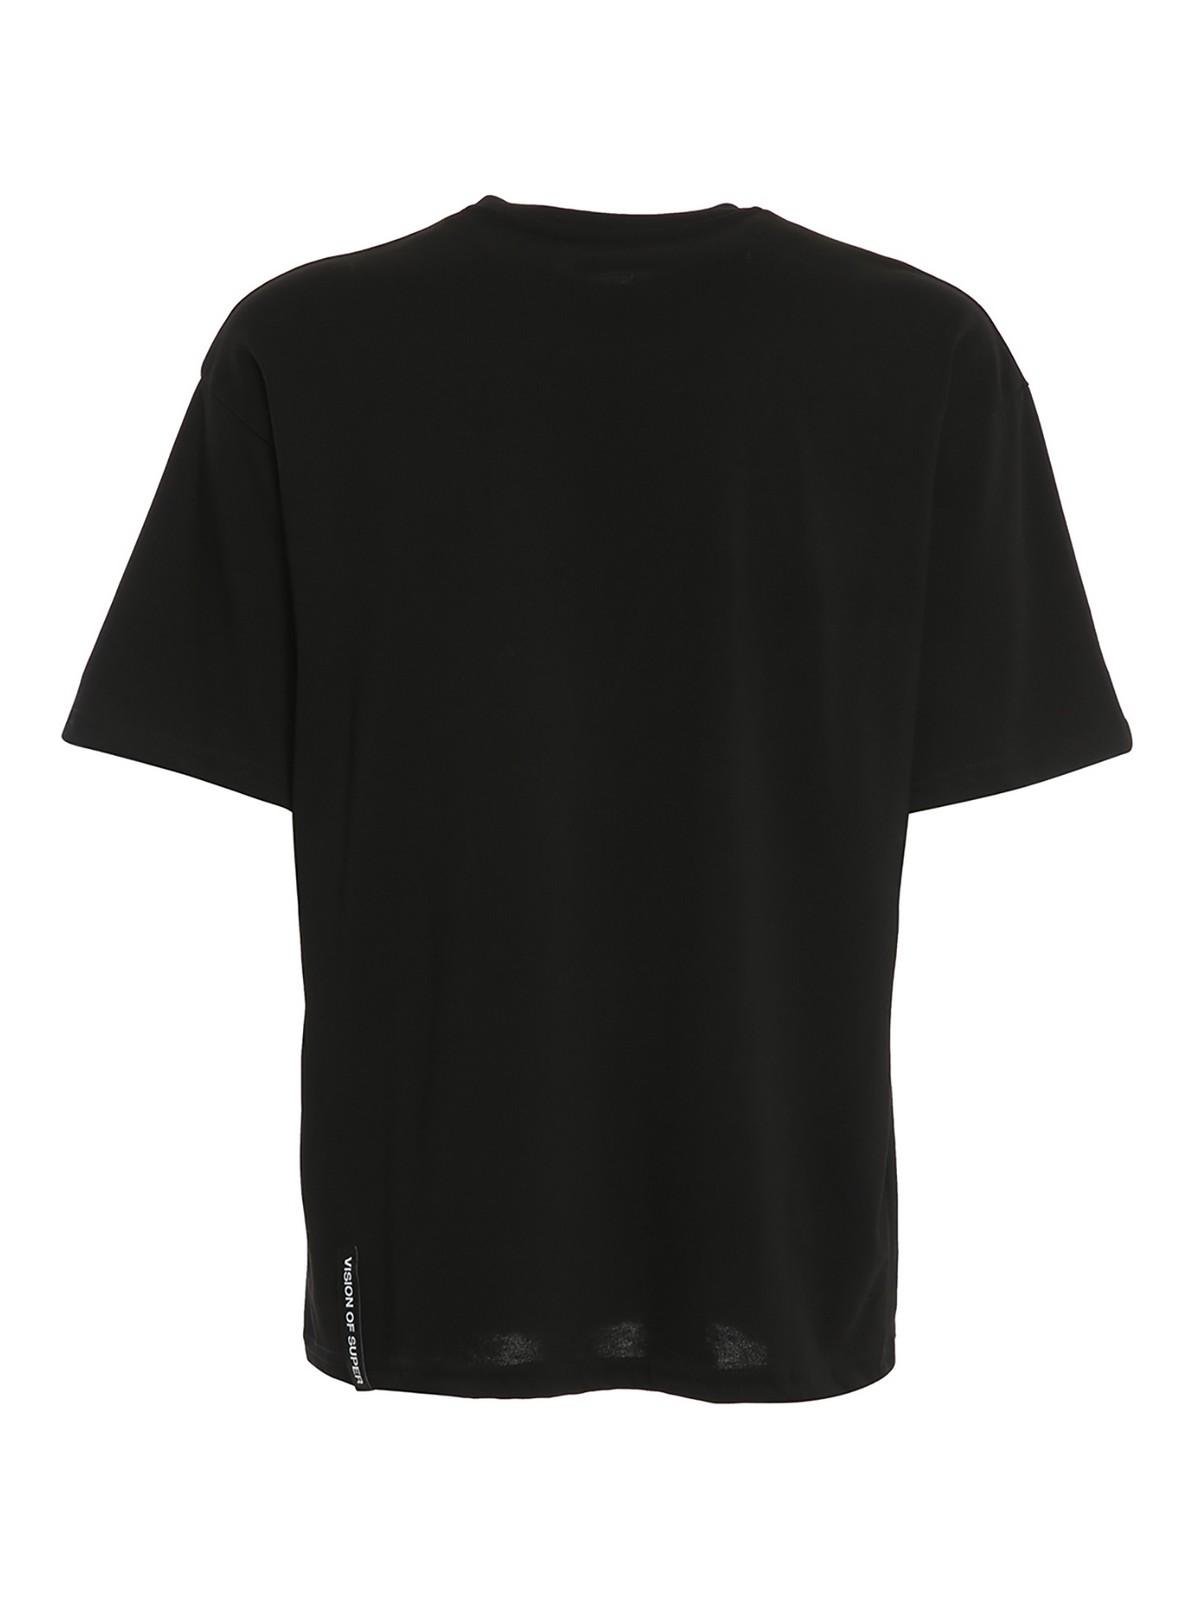 Immagine di Vision Of Super   Tshirt Rides Print